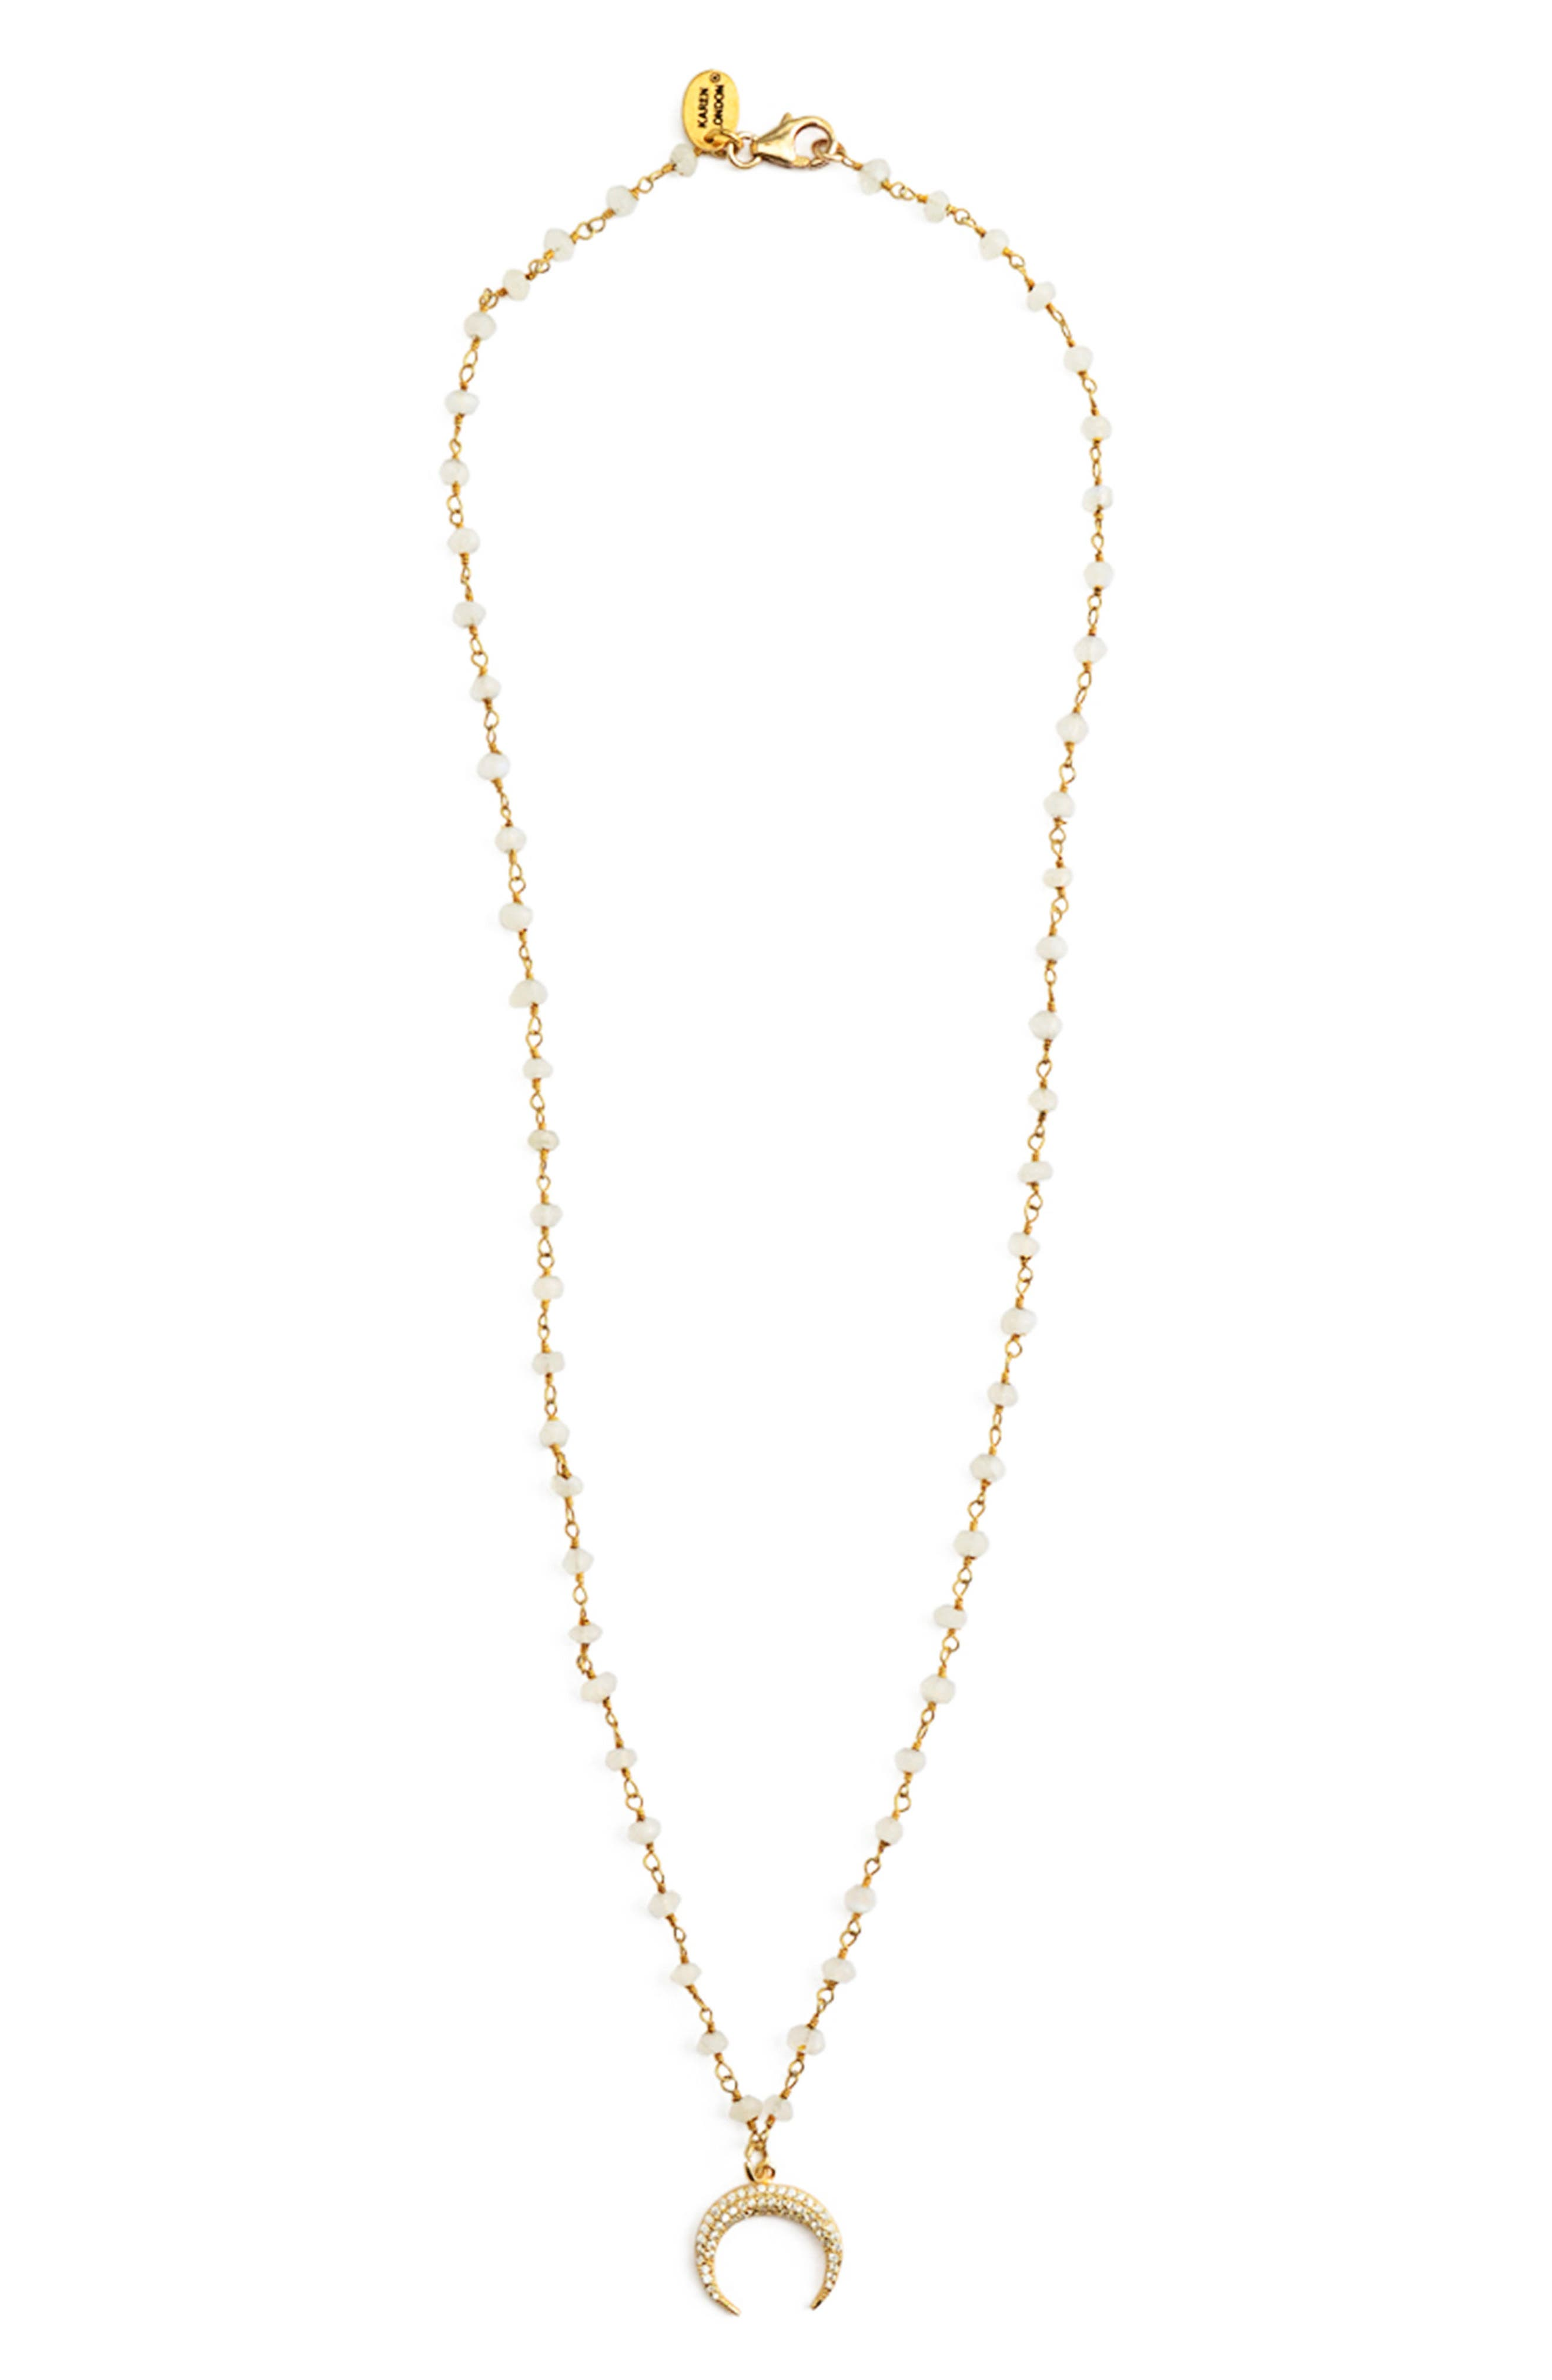 Main Image - Karen London Cellini Pendant Necklace